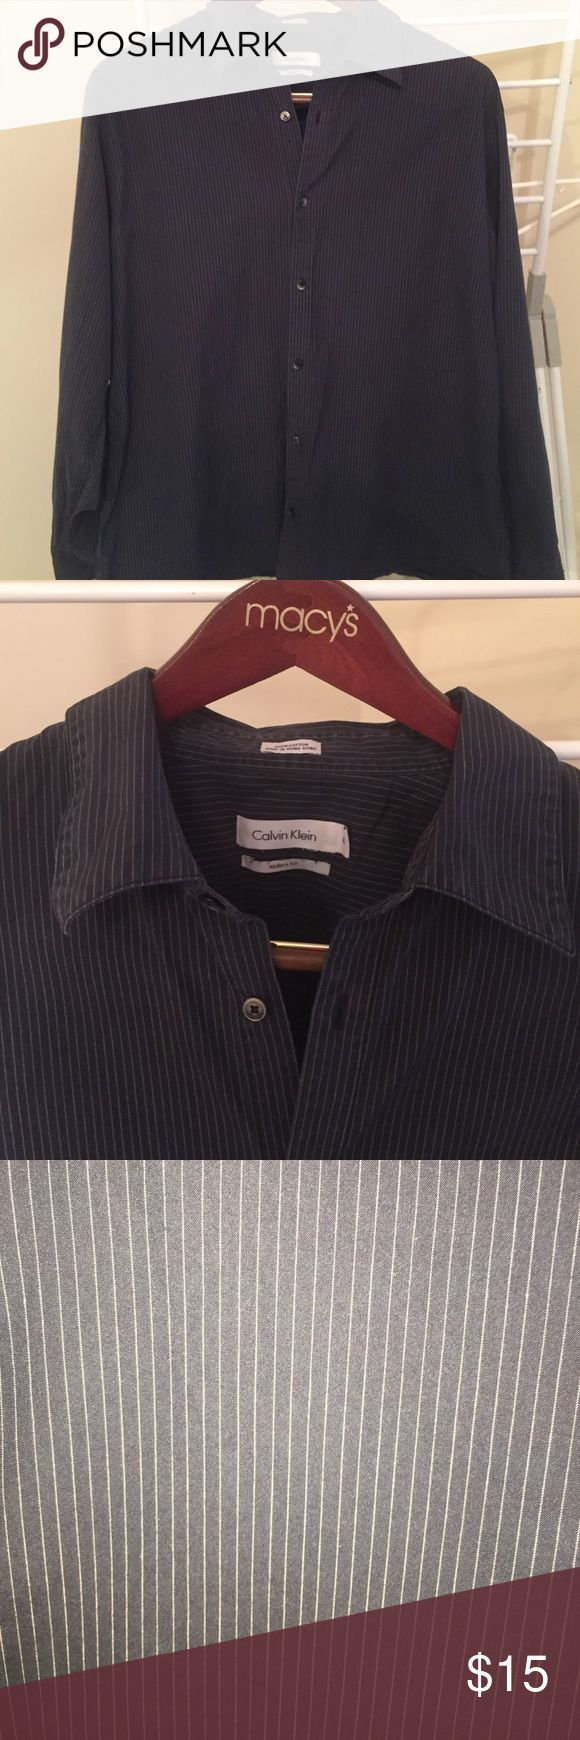 MEN's Calvin Klein navy blue striped dress shirt Calvin Klein striped navy blue dress shirt. Size XL. 100% cotton. Bought originally at Macy's. In good condition. Calvin Klein Shirts Dress Shirts